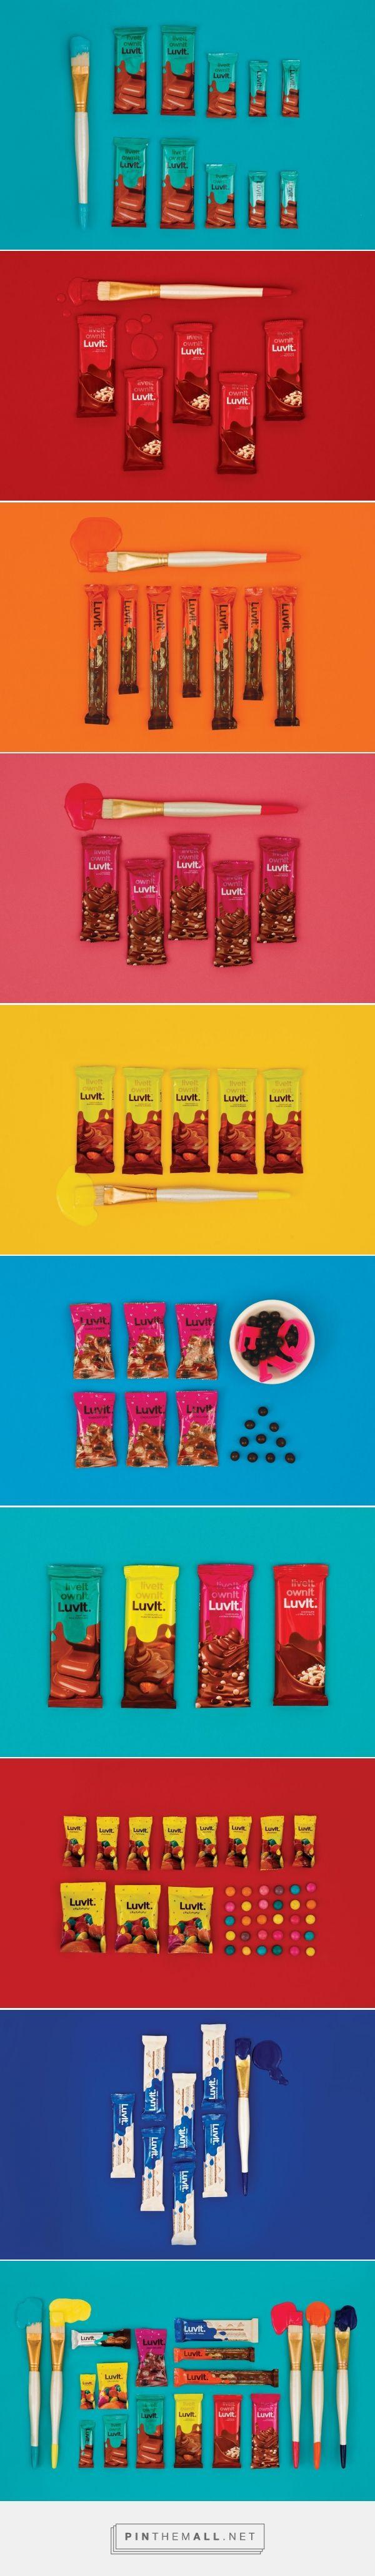 LuvIt Chocolates